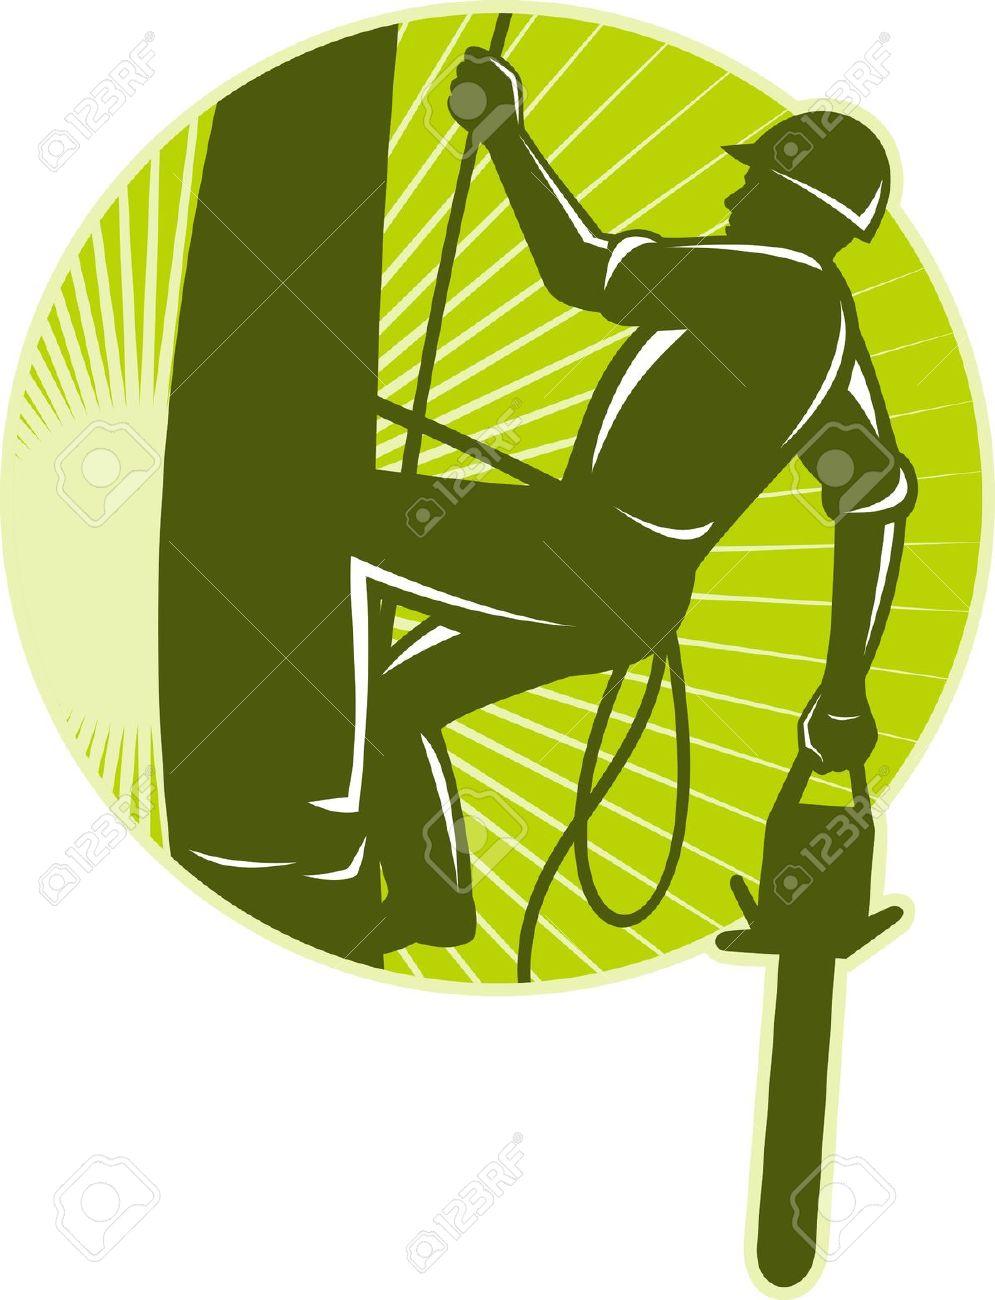 Illustration Of An Arborist Tree Surgeon With Chainsaw Climbing.